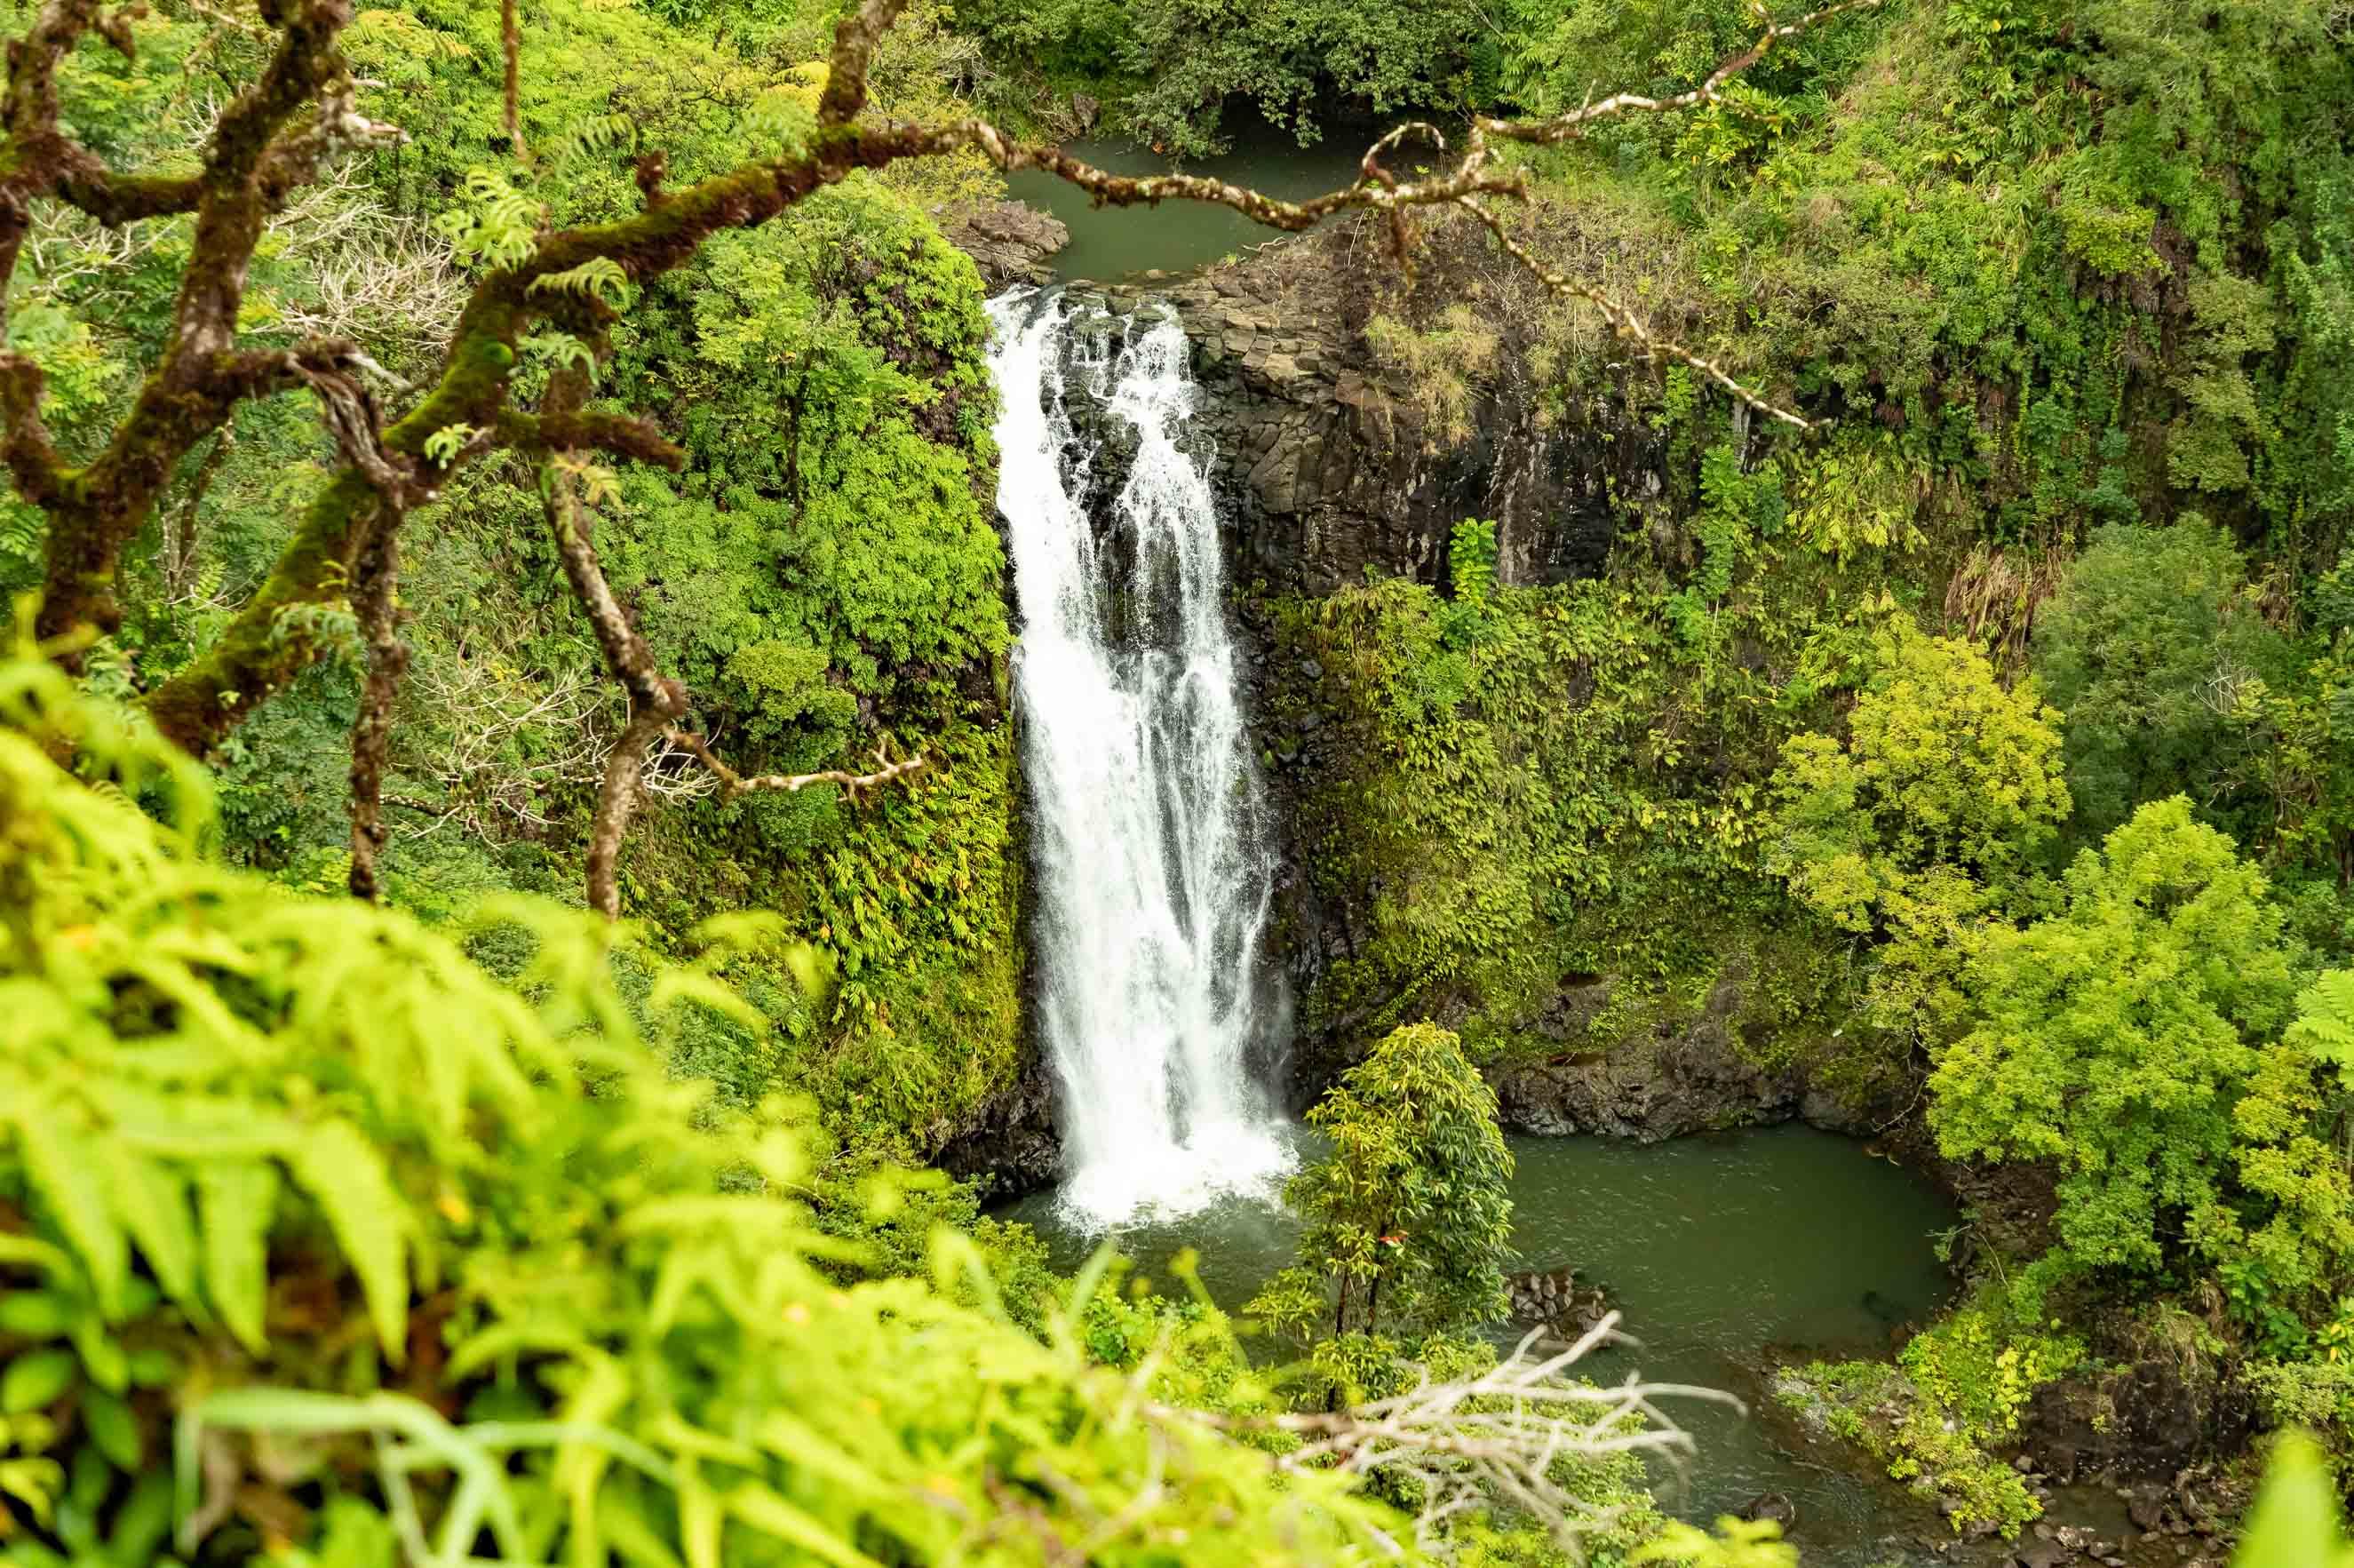 Road To Hana Watefall in Valley Maui